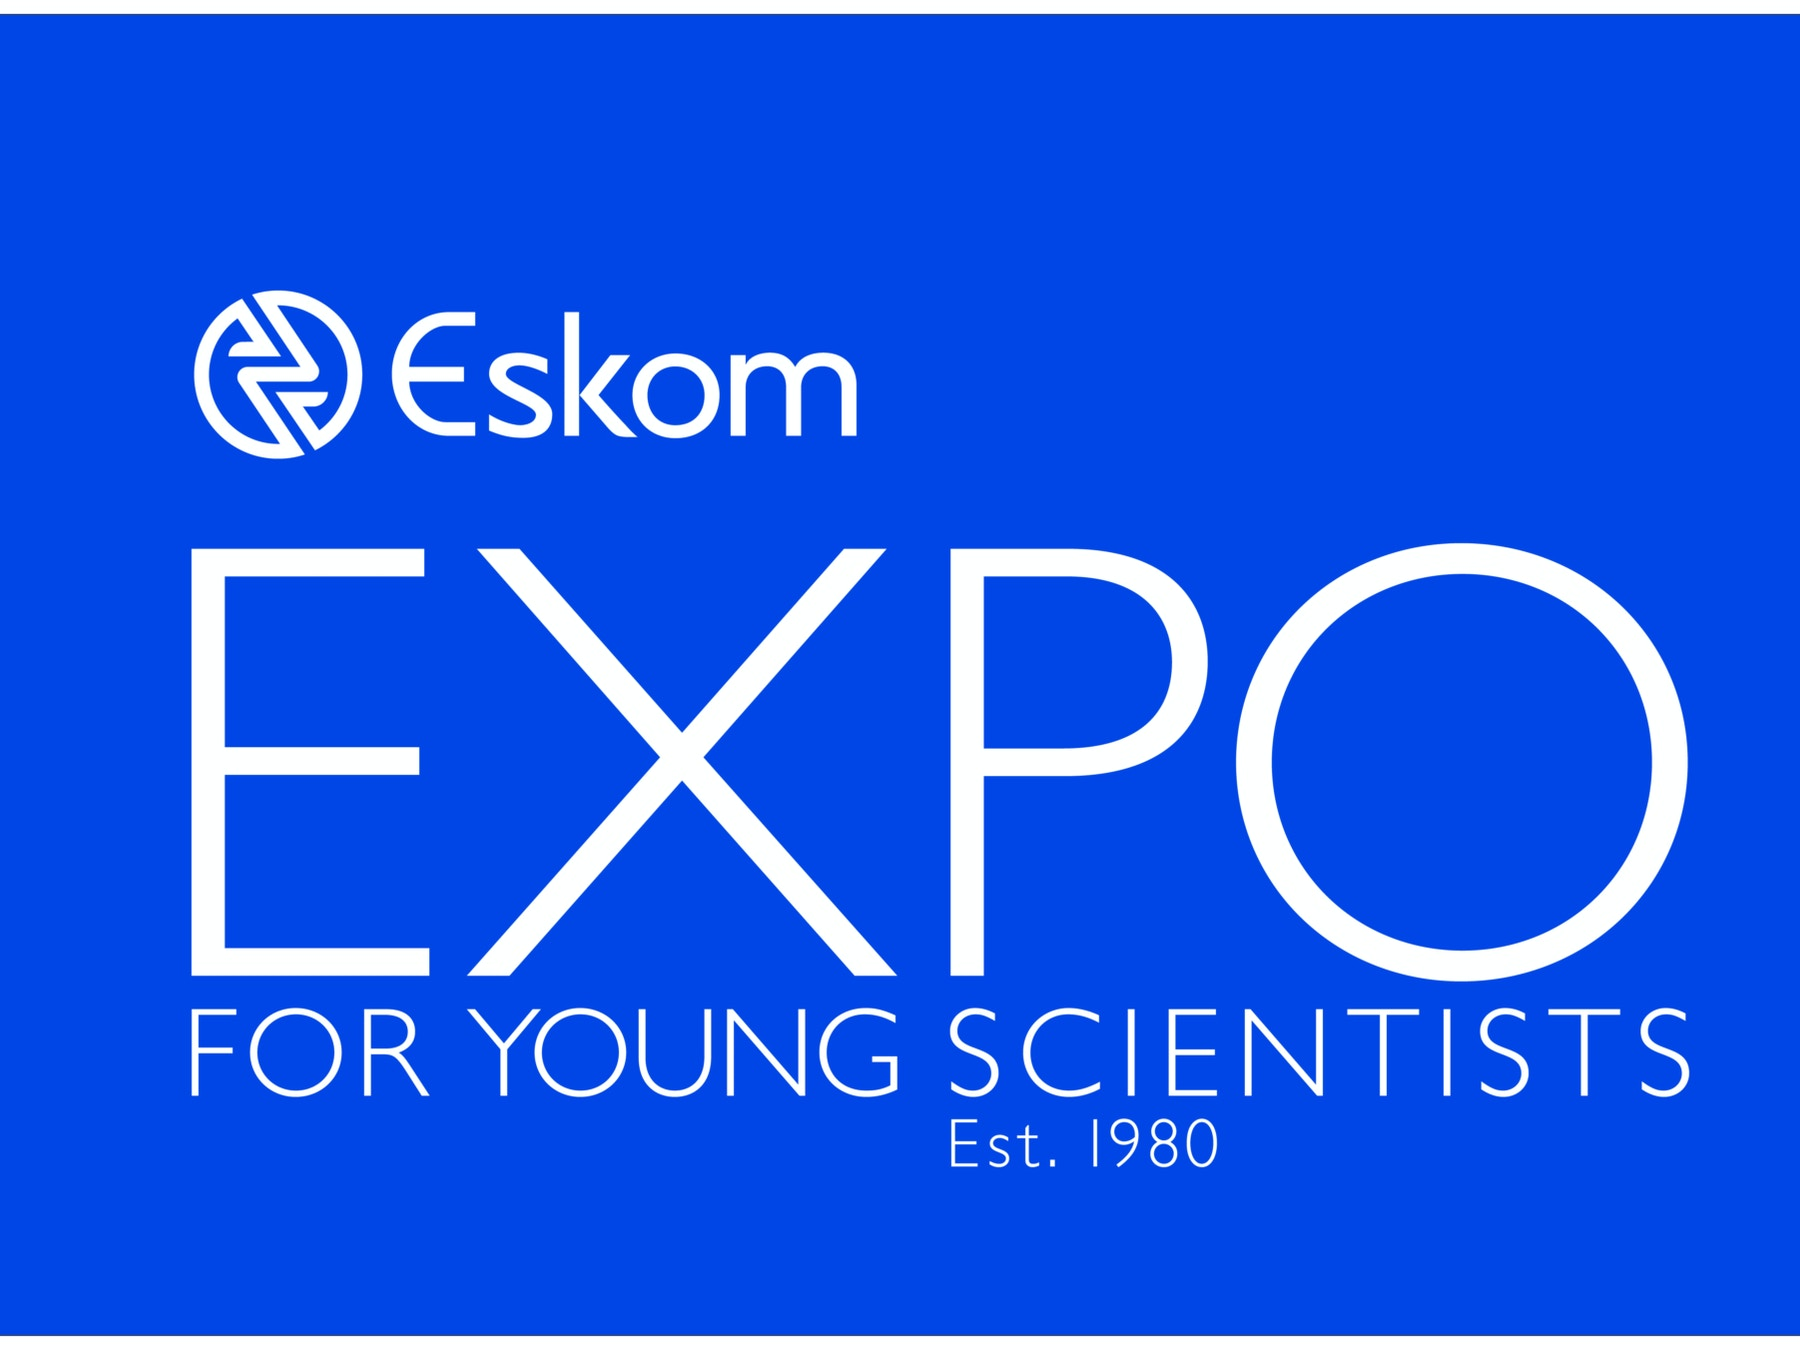 Eskom-Expo